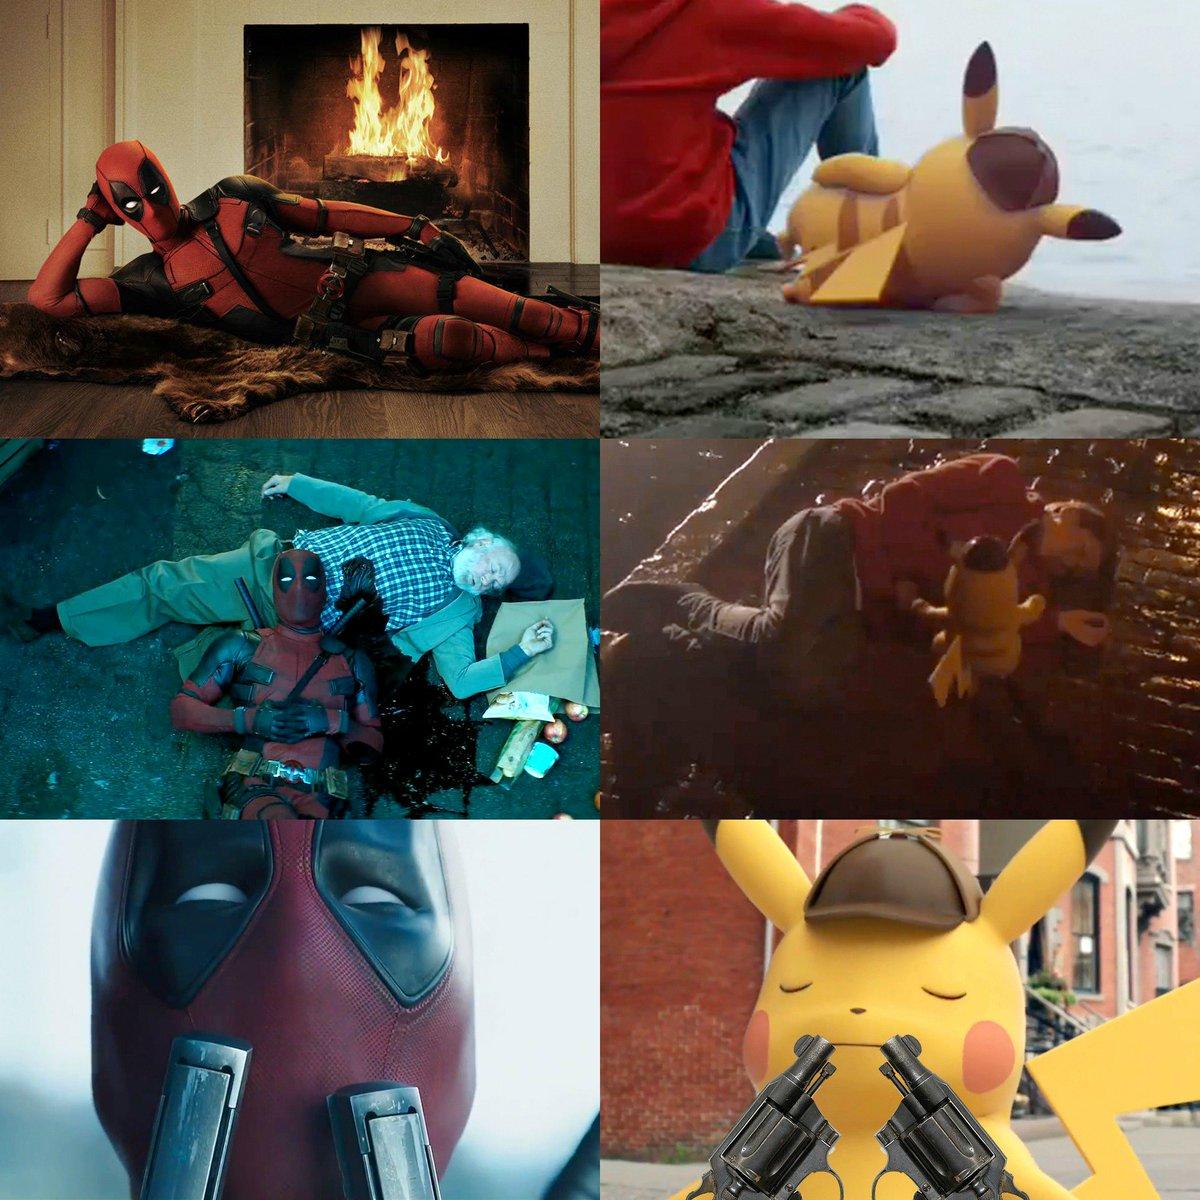 RottenTomatoes detective pikachu